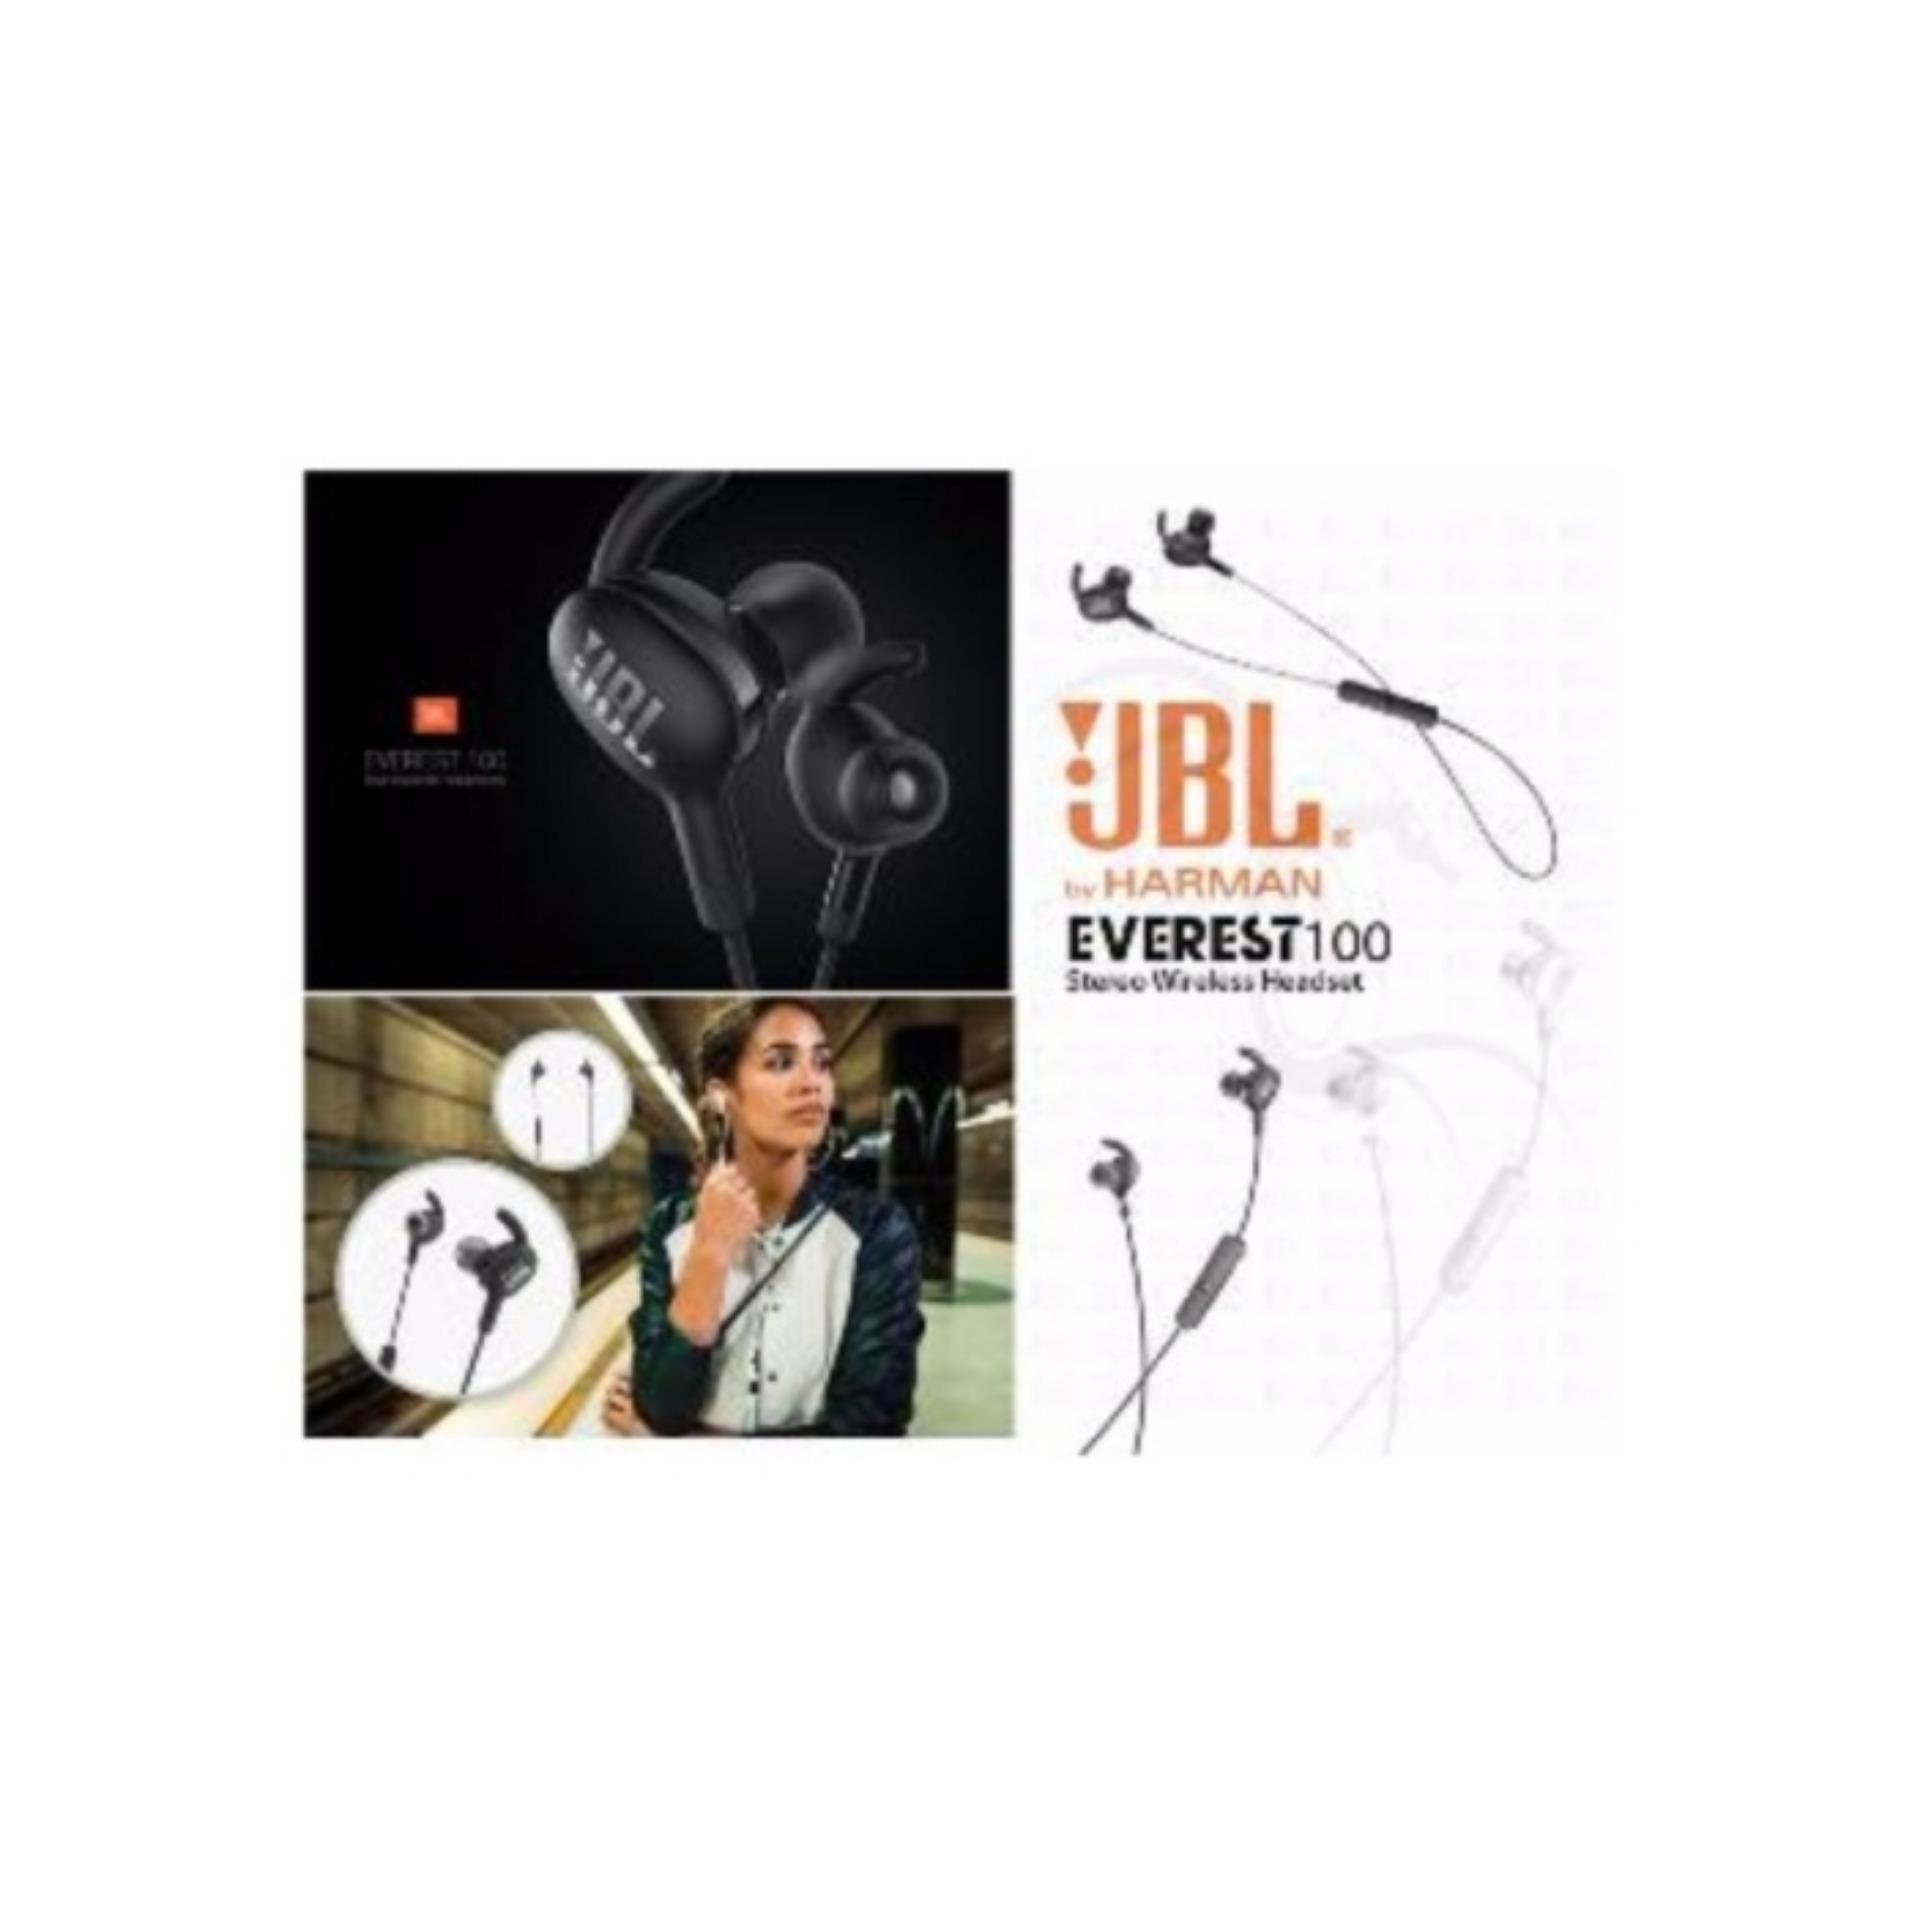 Headset Jbl Wireless Everest 100 Ultimate Stereo Bass Hitam Daftar In Ear Headphone